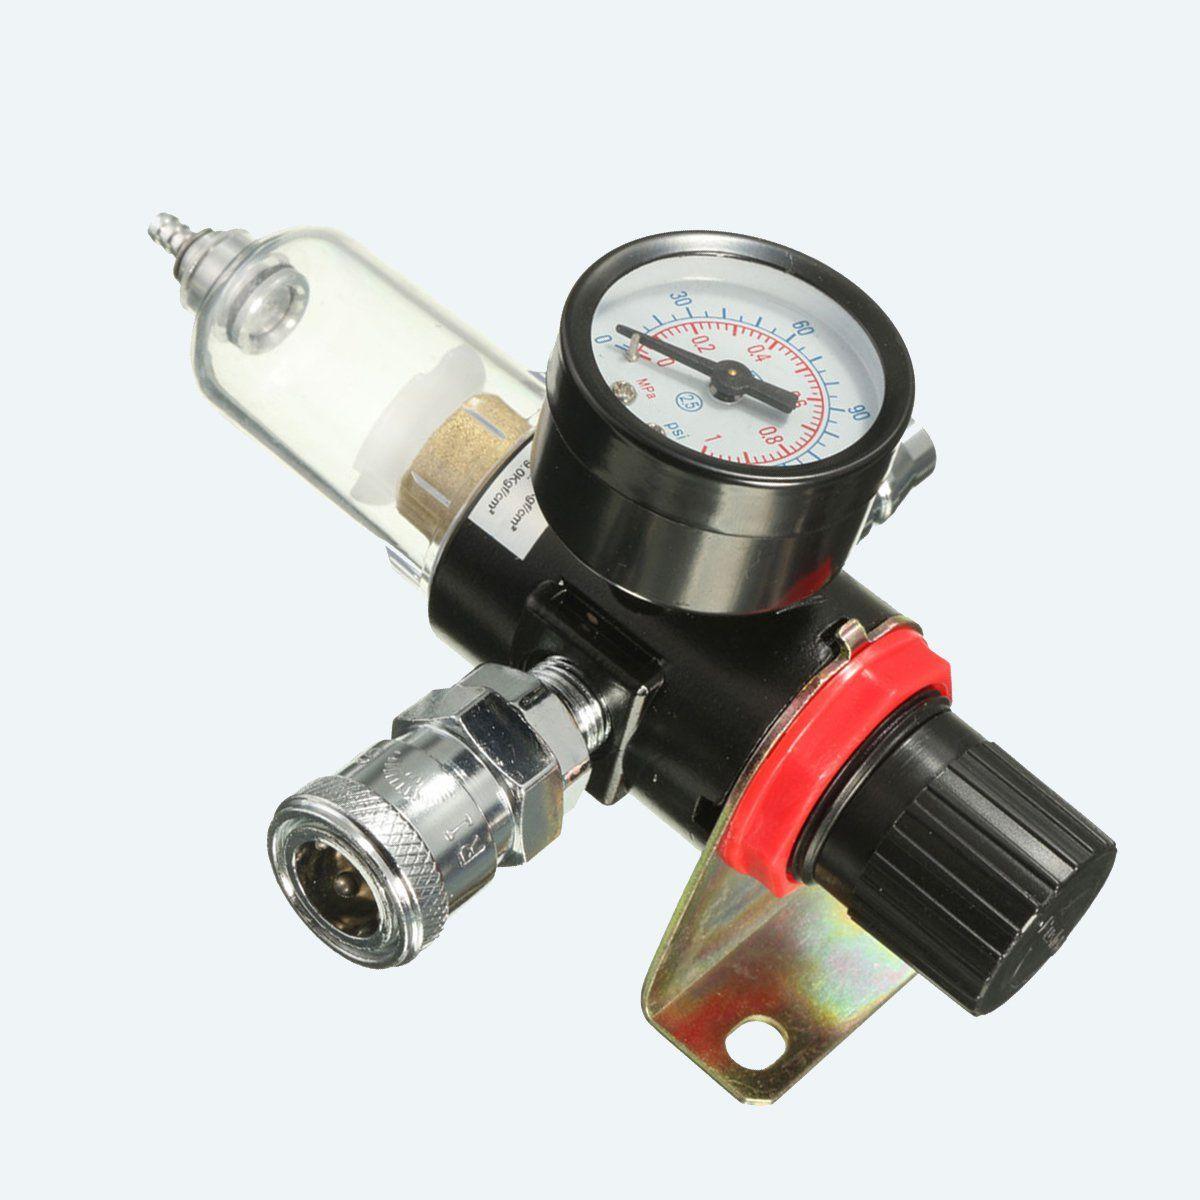 1 4 Air Compressor Oil Water Regulator Filter Pressure Gauge Moisture Trap In 2020 Air Compressor Oil Air Compressor Air Tools